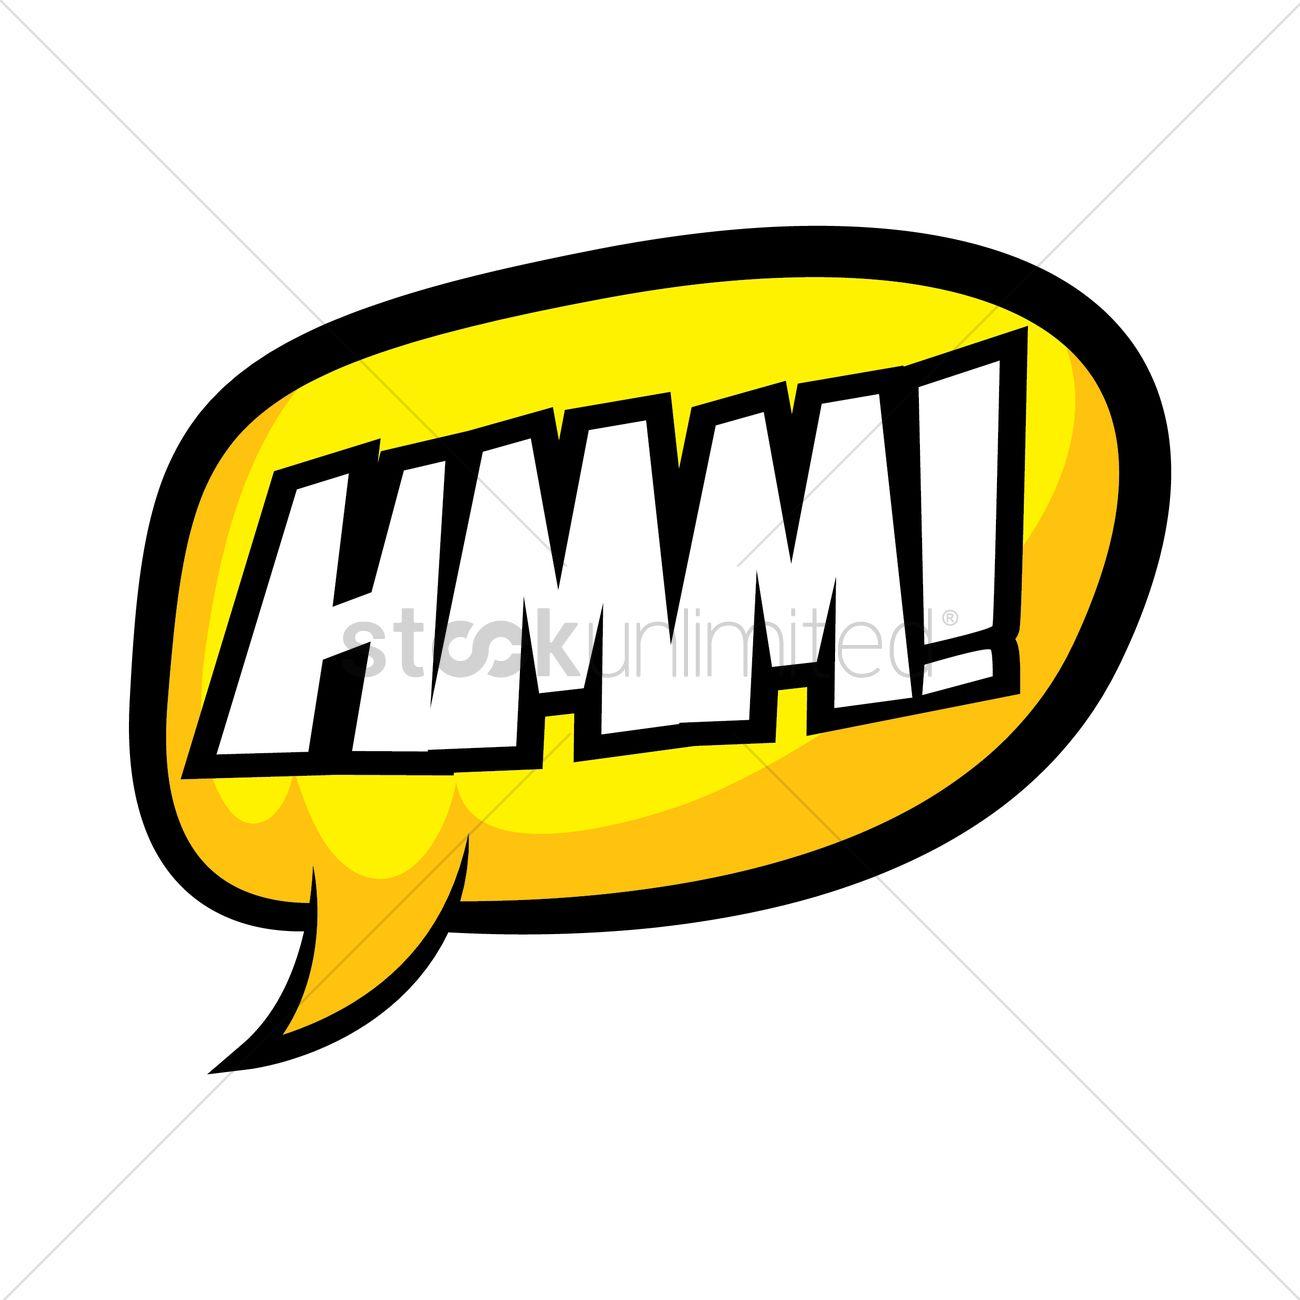 hmm images usseek com Retro Woman Thinking Clip Art People Thinking Clip Art